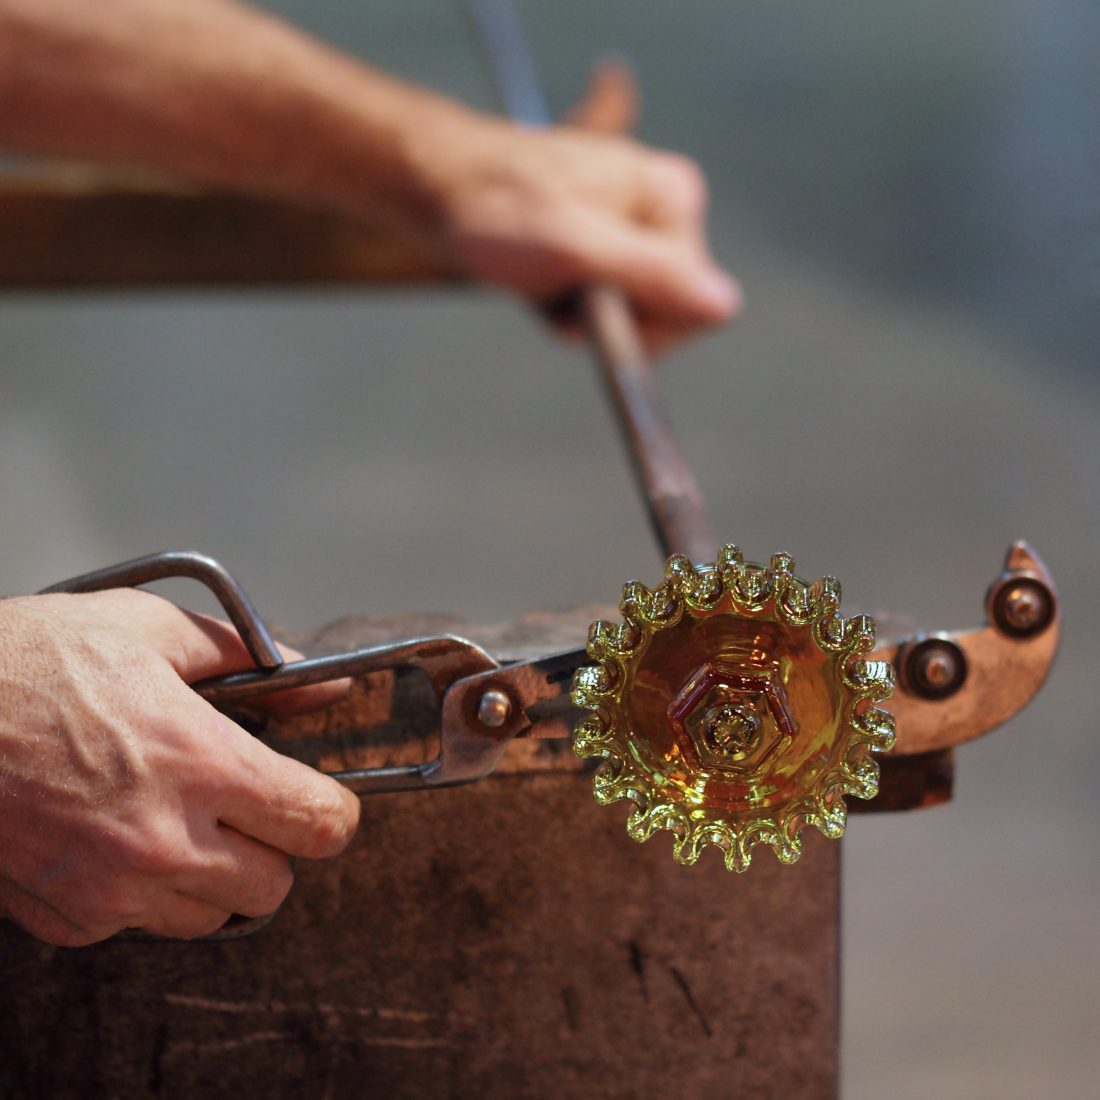 Meisenthal Fabrication de la boule ROTOR dans l'atelier du Ciav_design Agence GG